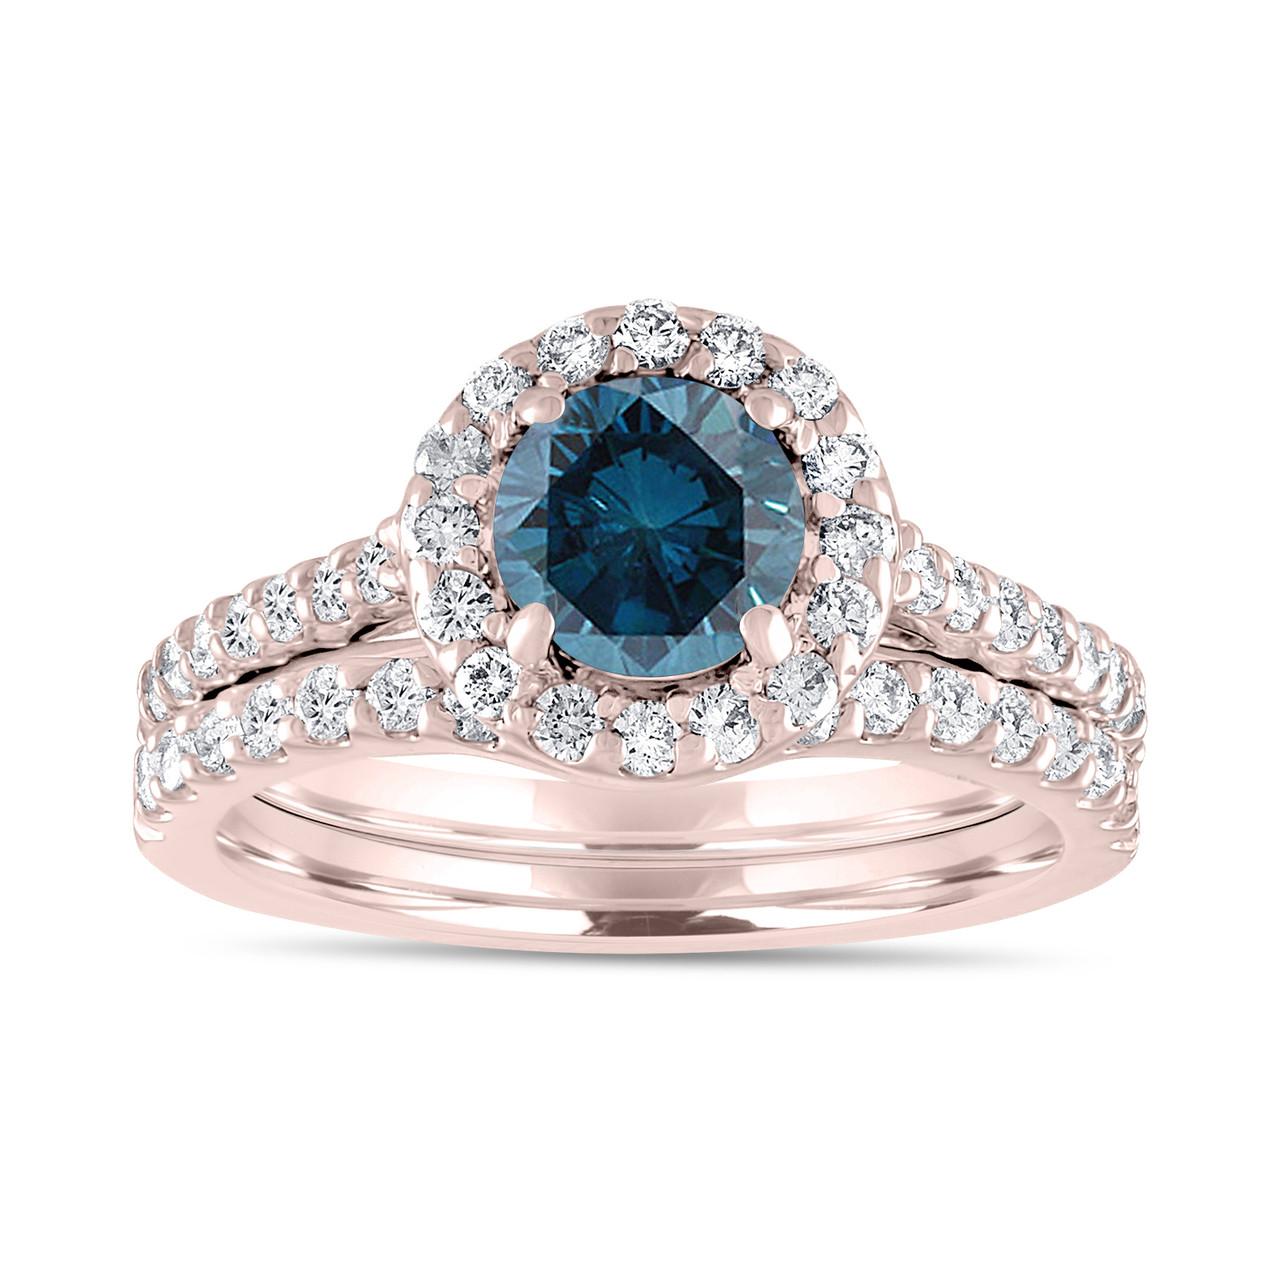 184 Carat Fancy Blue Diamond Engagement Ring Set Bridal Wedding